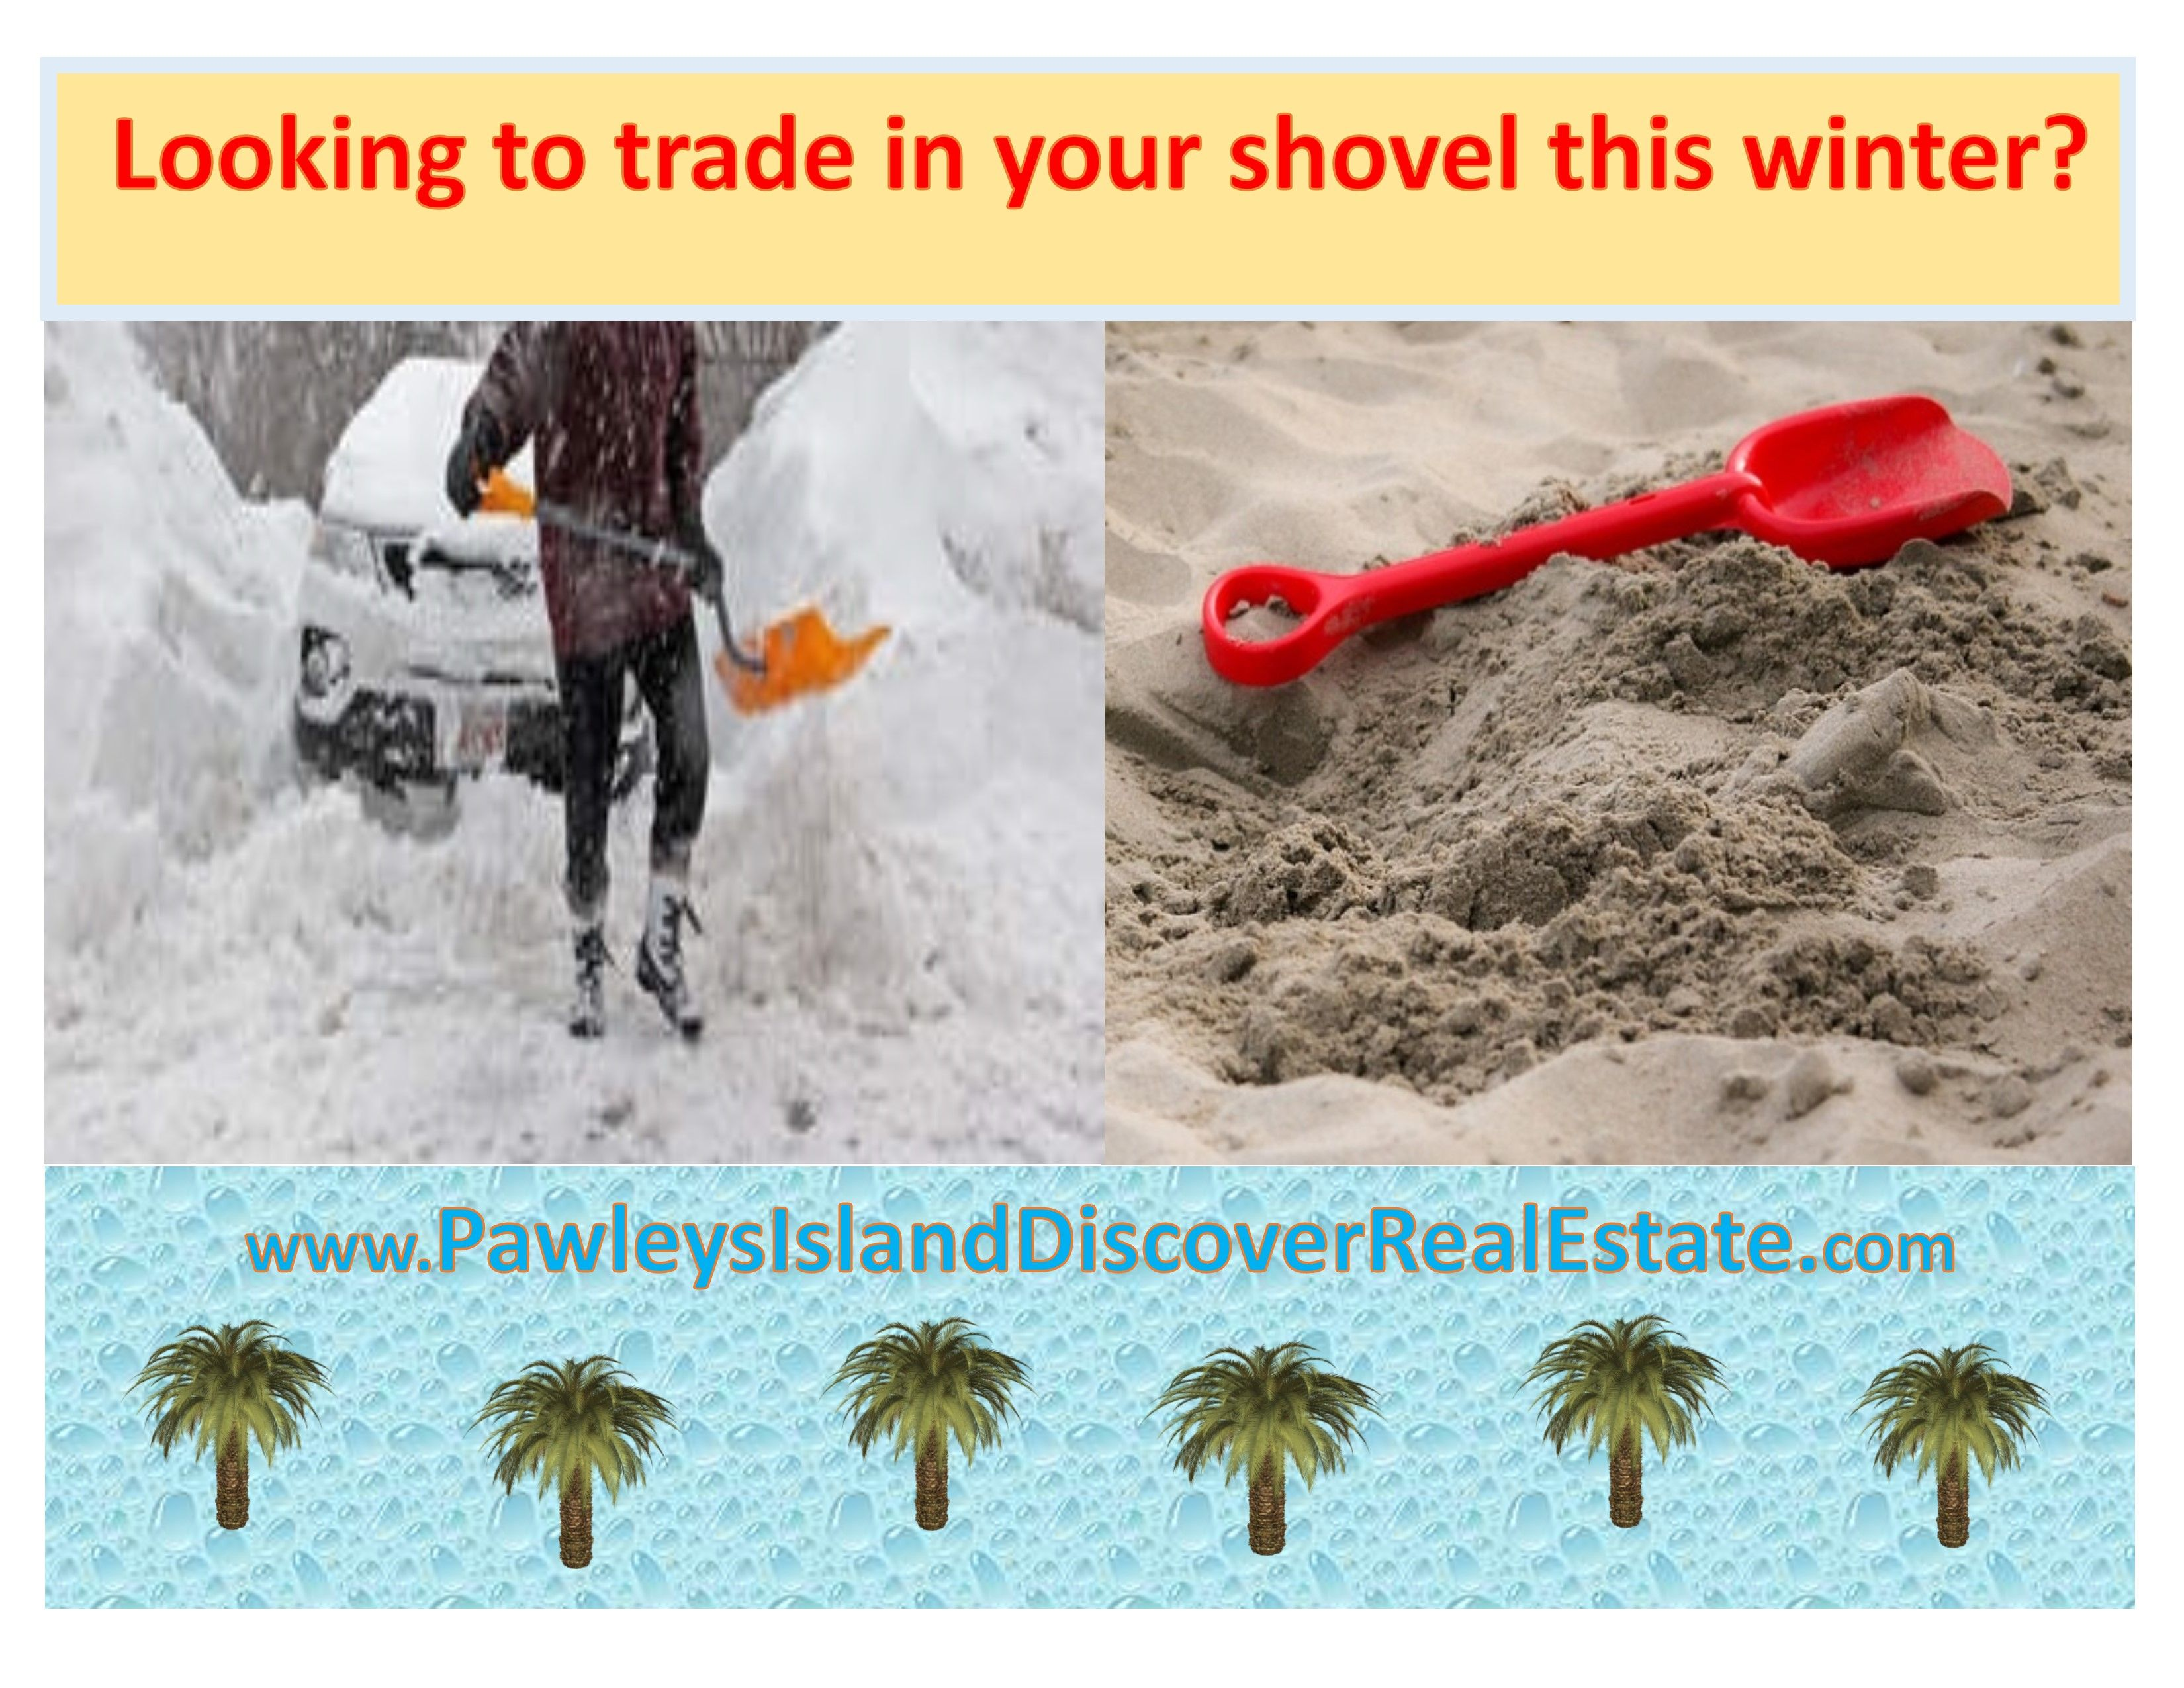 www.PawleysIslandDiscoverRealEstate.com